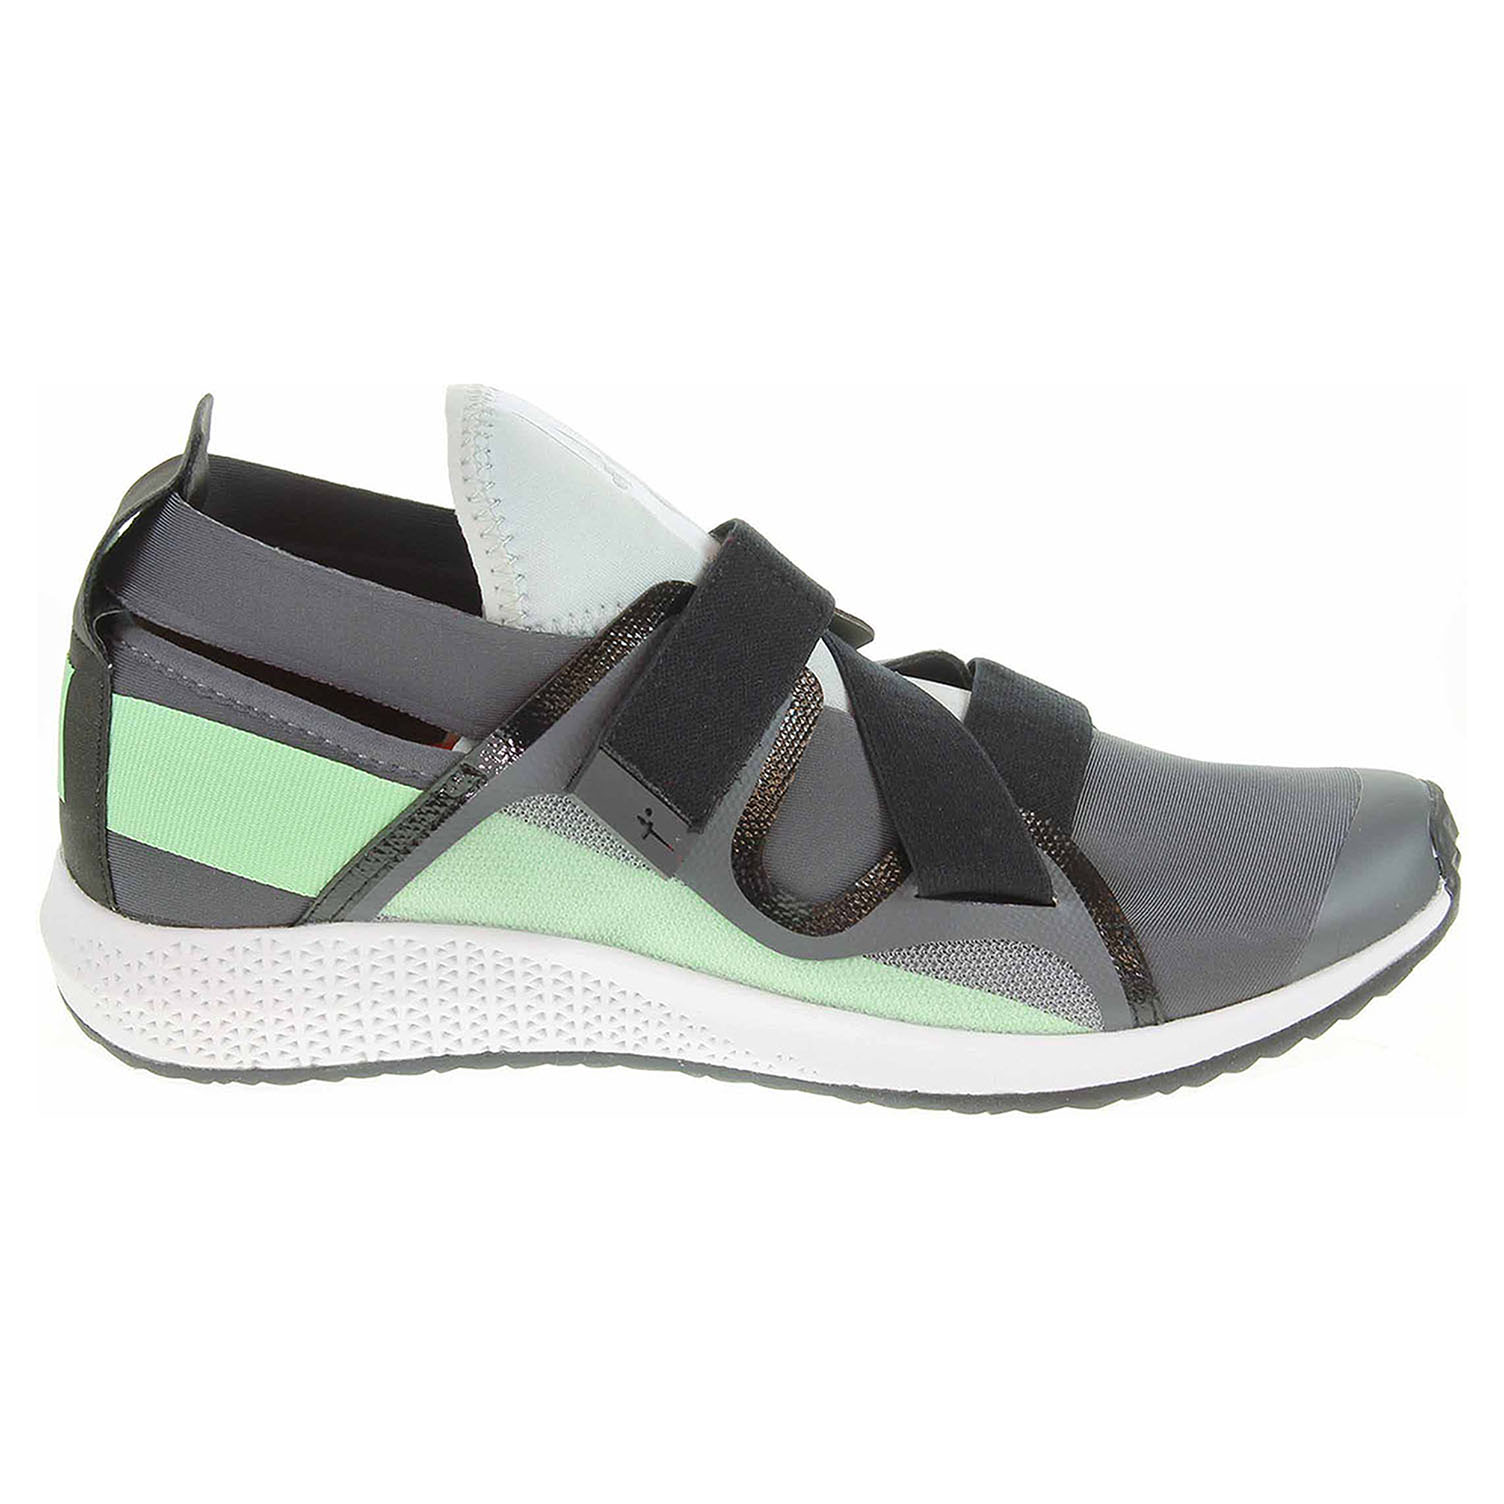 Tamaris dámská obuv 1-24706-20 grey comb 1-1-24706-20 221 39